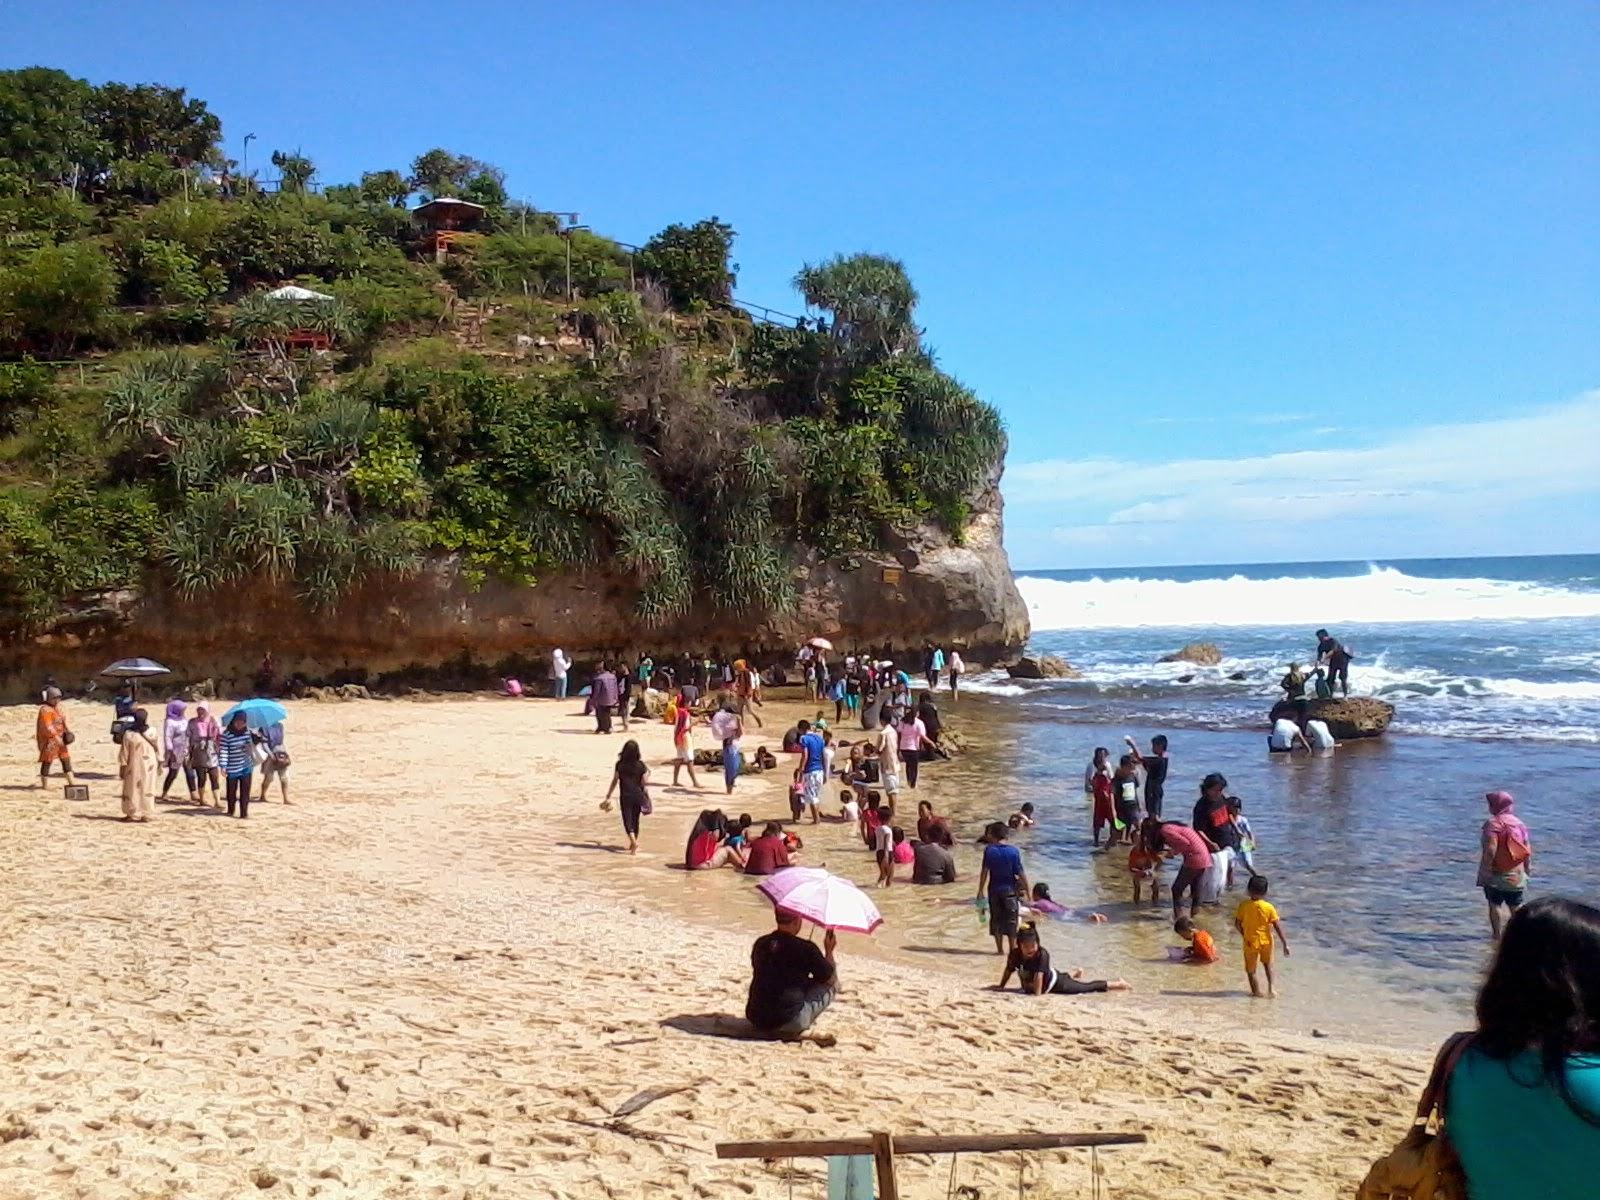 Wisata  Pantai Indrayanti - Gunung Kidul - Jogja